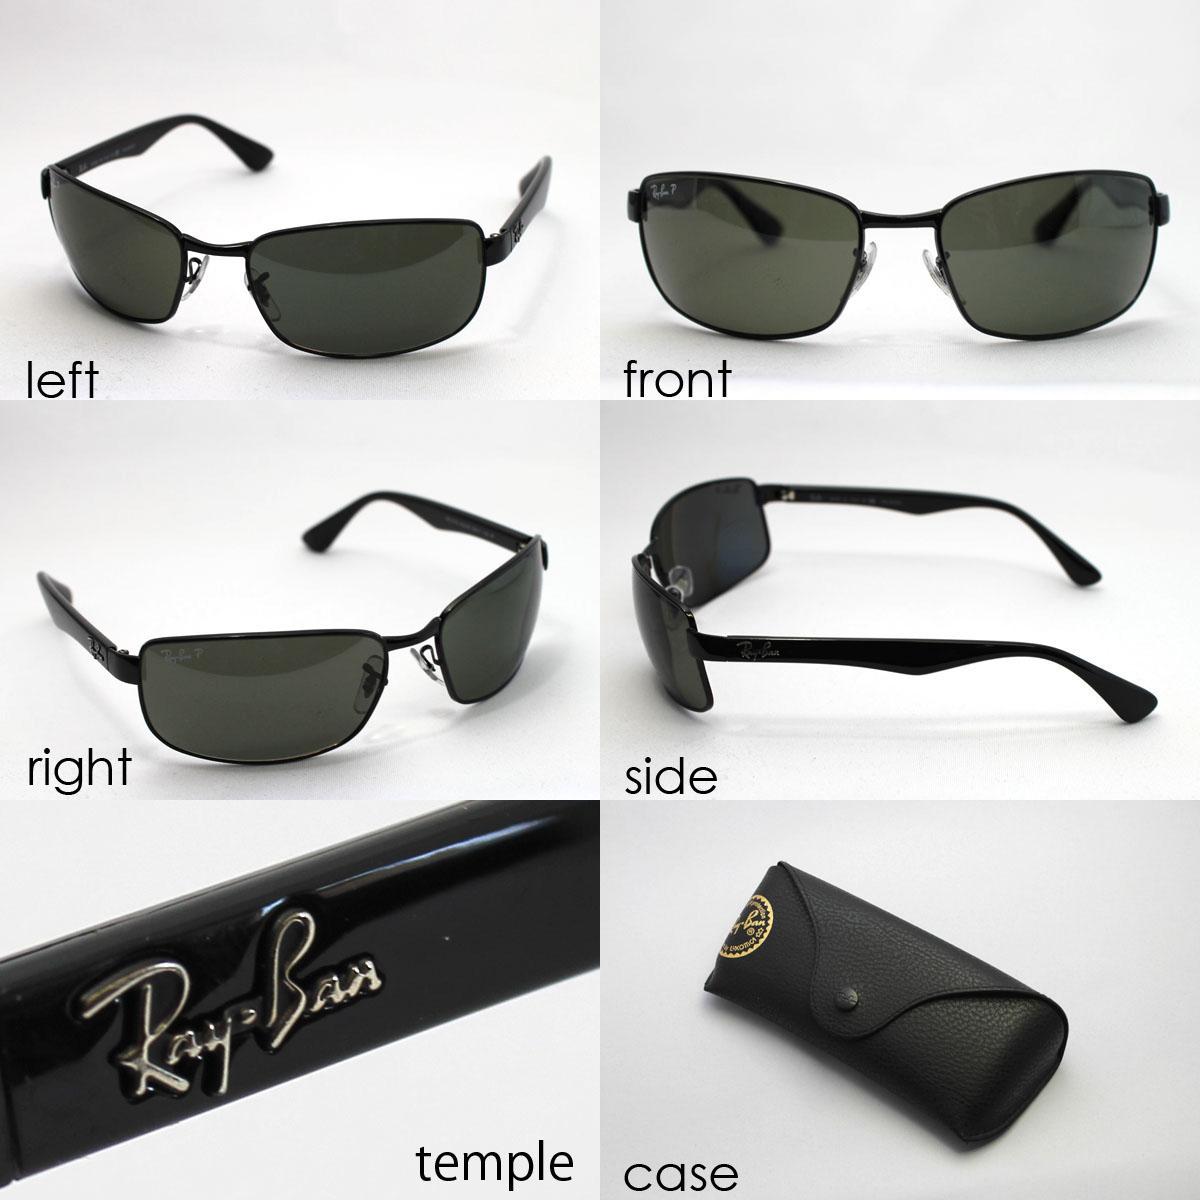 6d0138765c7 00258 RB3478 Ray-Ban (RayBan) rayban sunglasses polarization NEW ARRIVAL  glassmania sunglasses